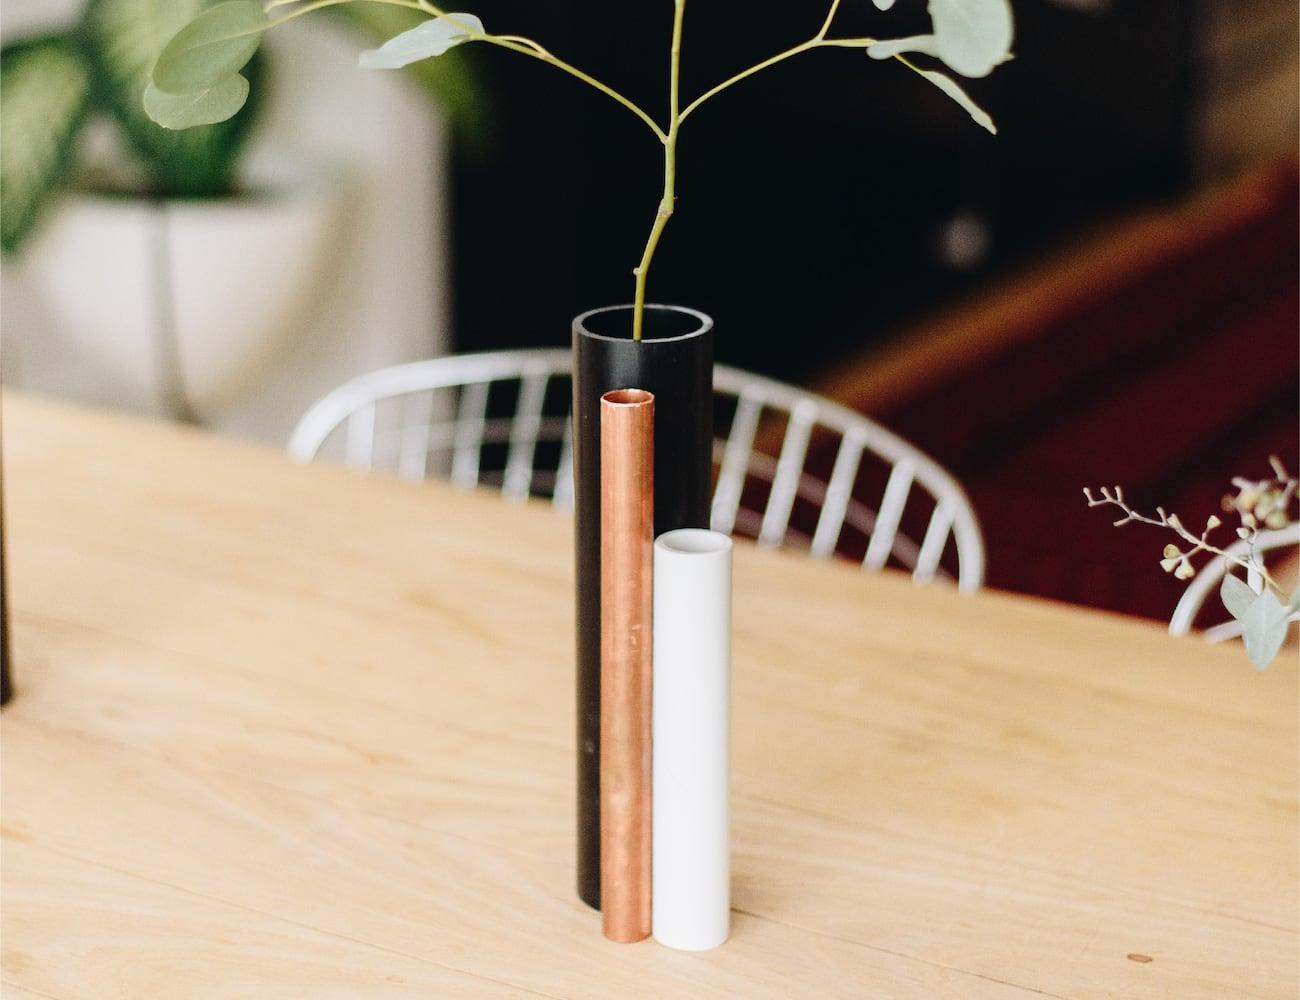 Pipe Vase Repurposed Flower Holder makes beautiful use of construction scraps